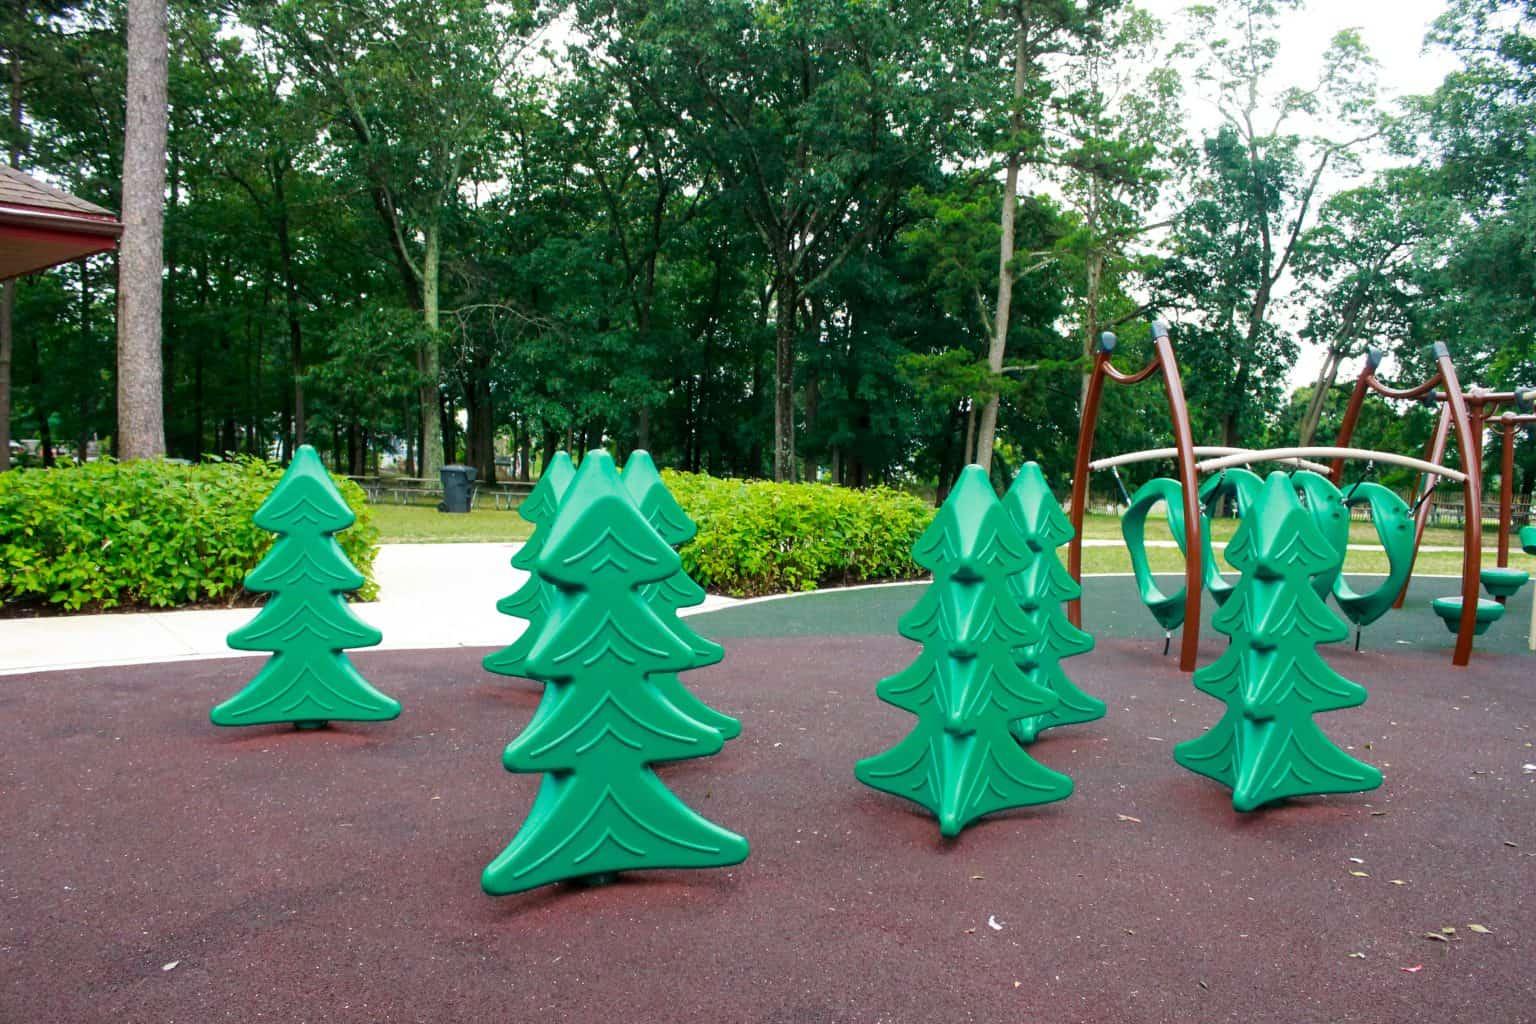 windward-beach-park-playground-brick-nj_27651422573_o-1536x1024